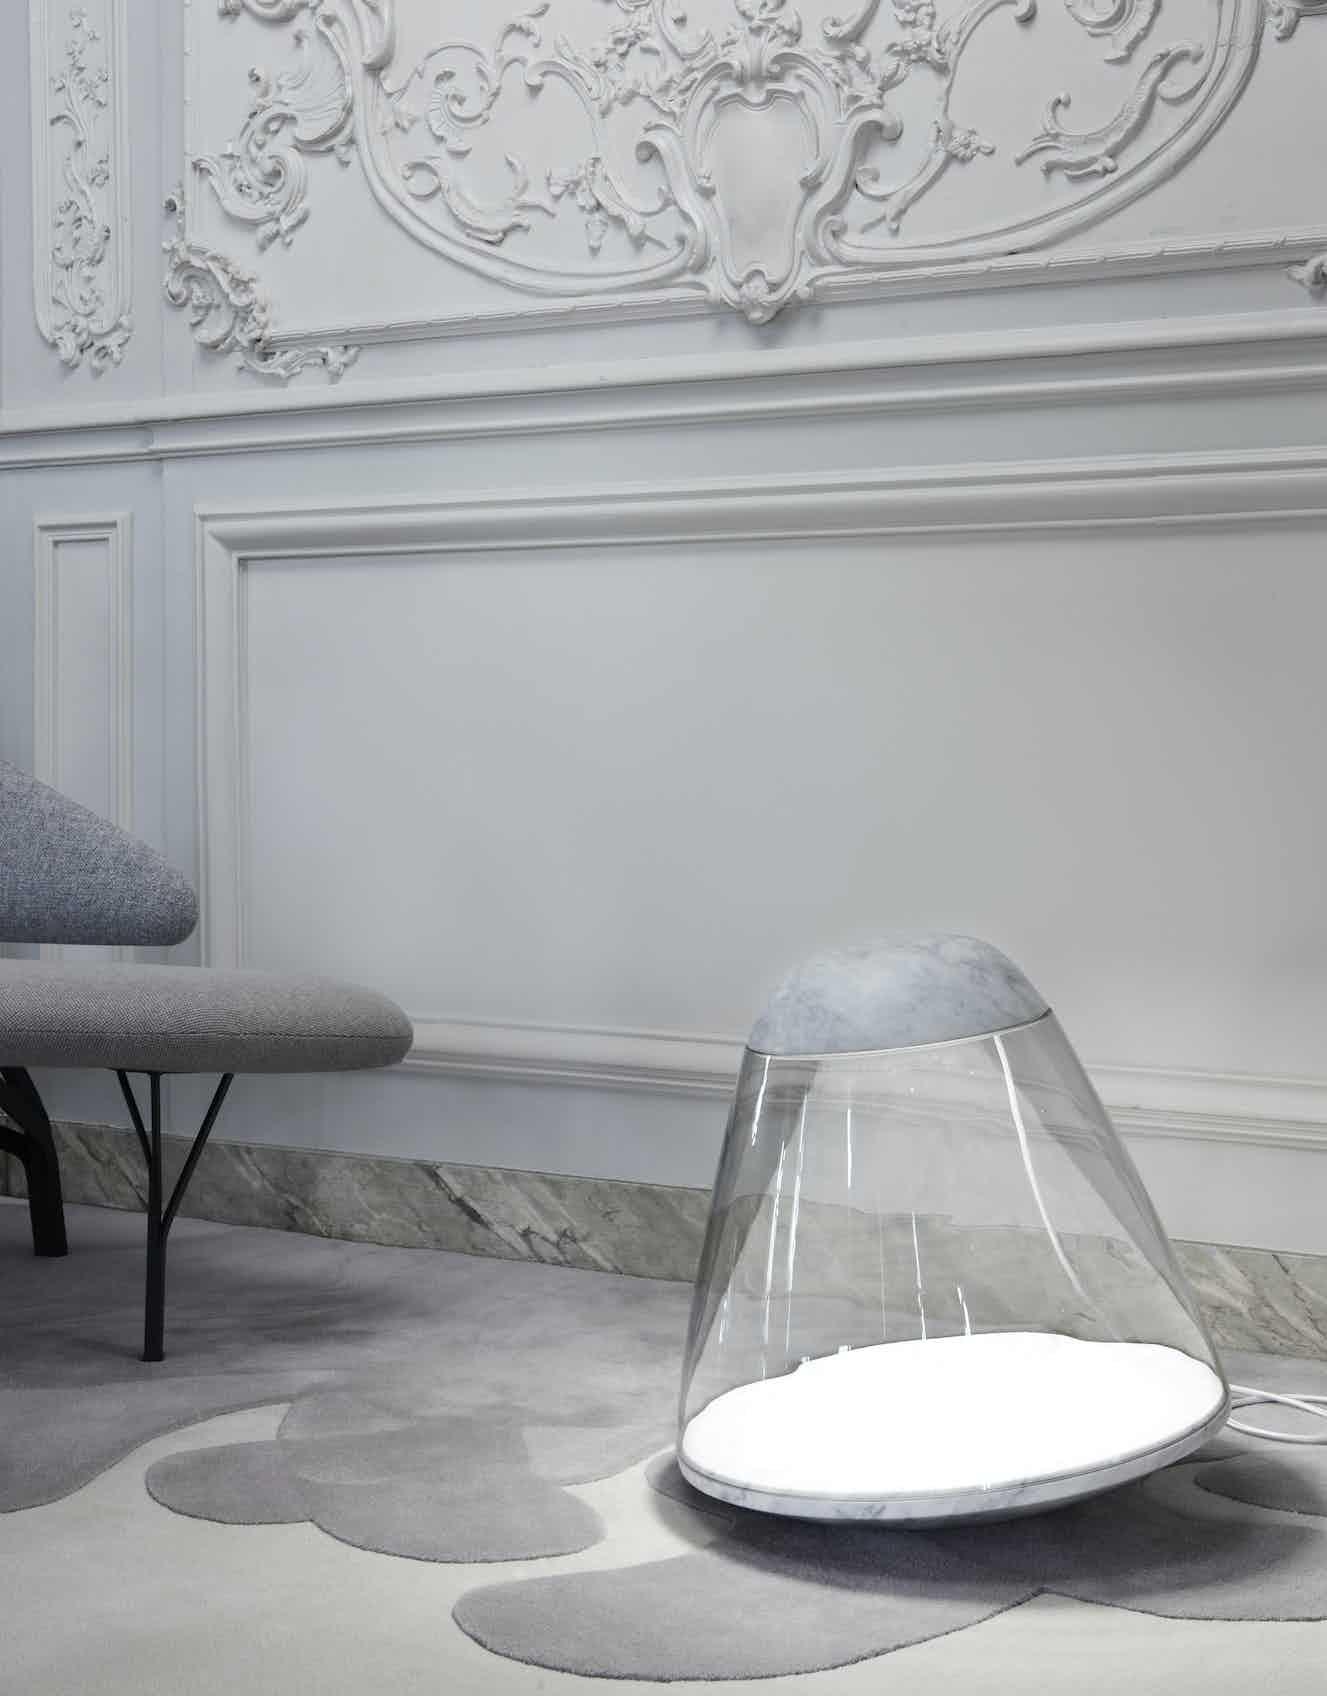 La-chance-furniture-apollo-floor-lamp-grey-room-haute-living